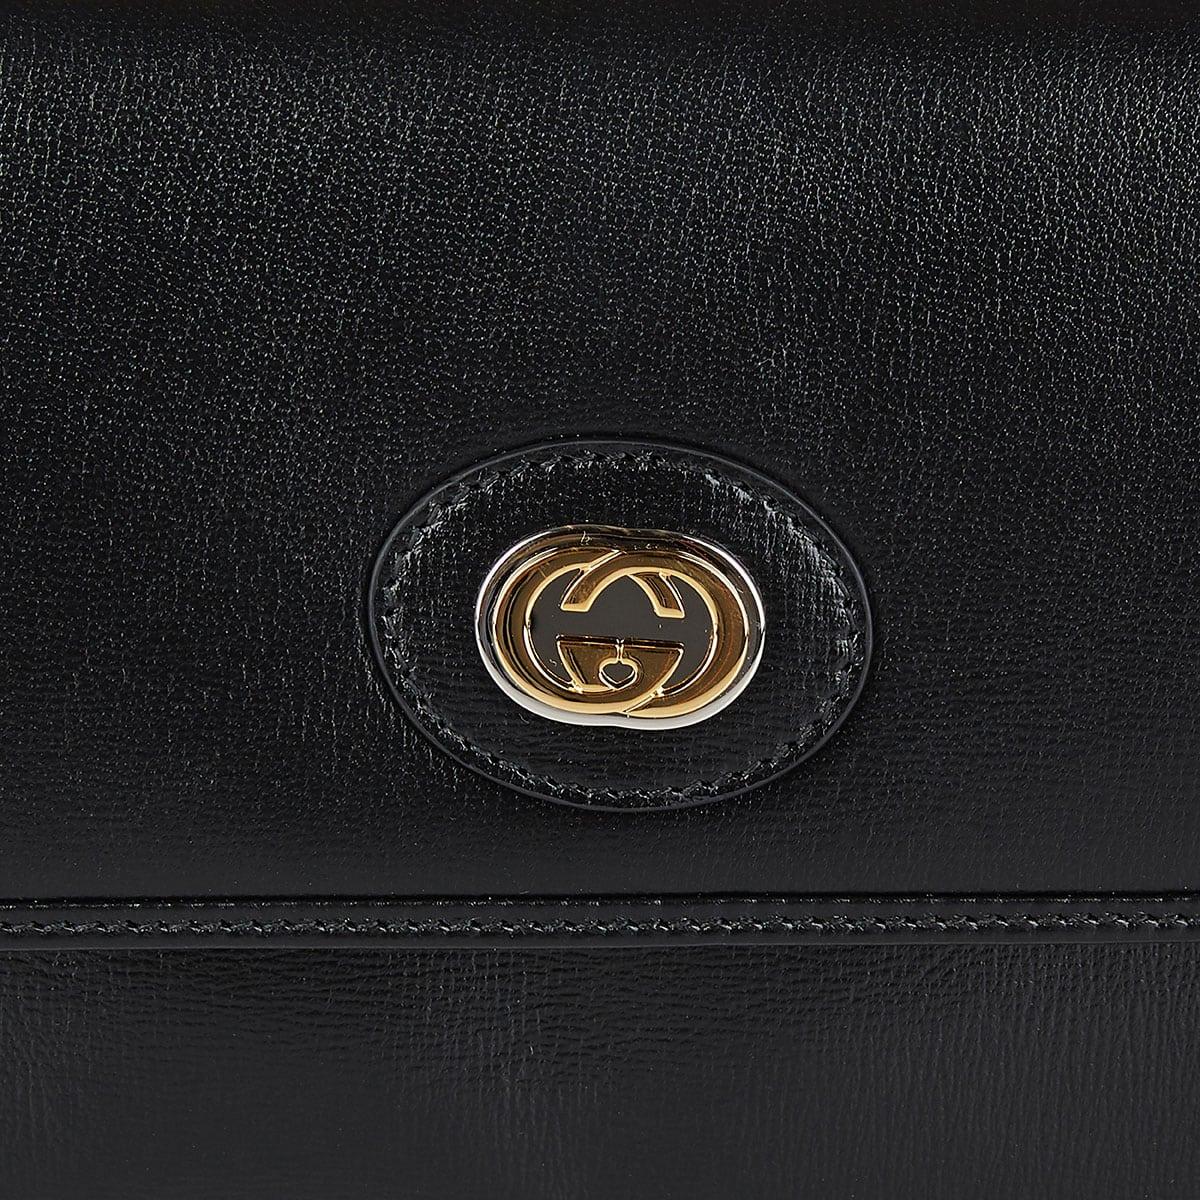 GG logo small chain bag